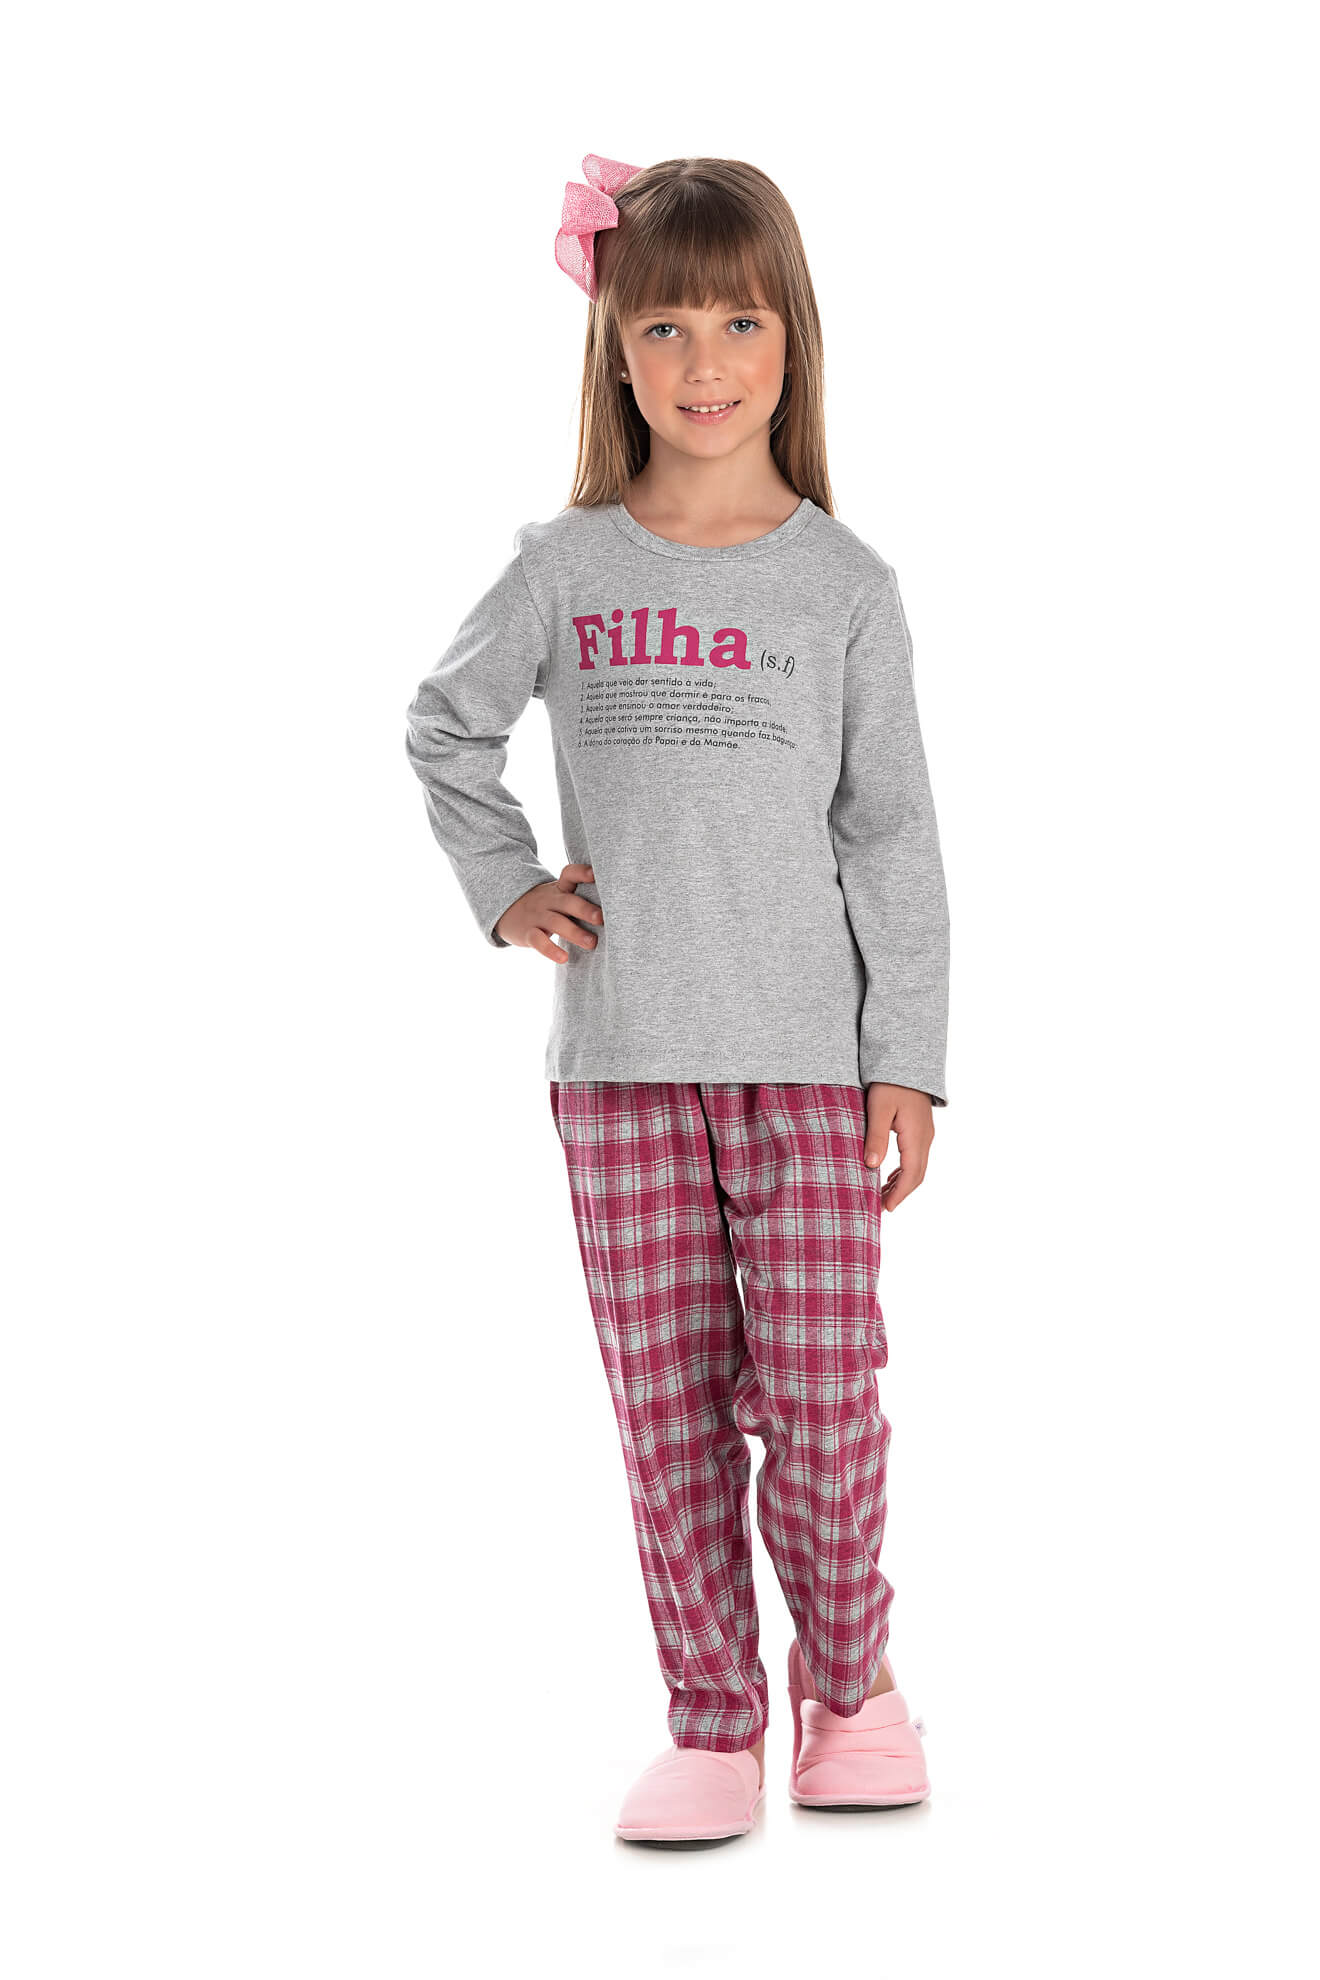 004/F - Pijama Infantil Feminino Xadrez Família Completa